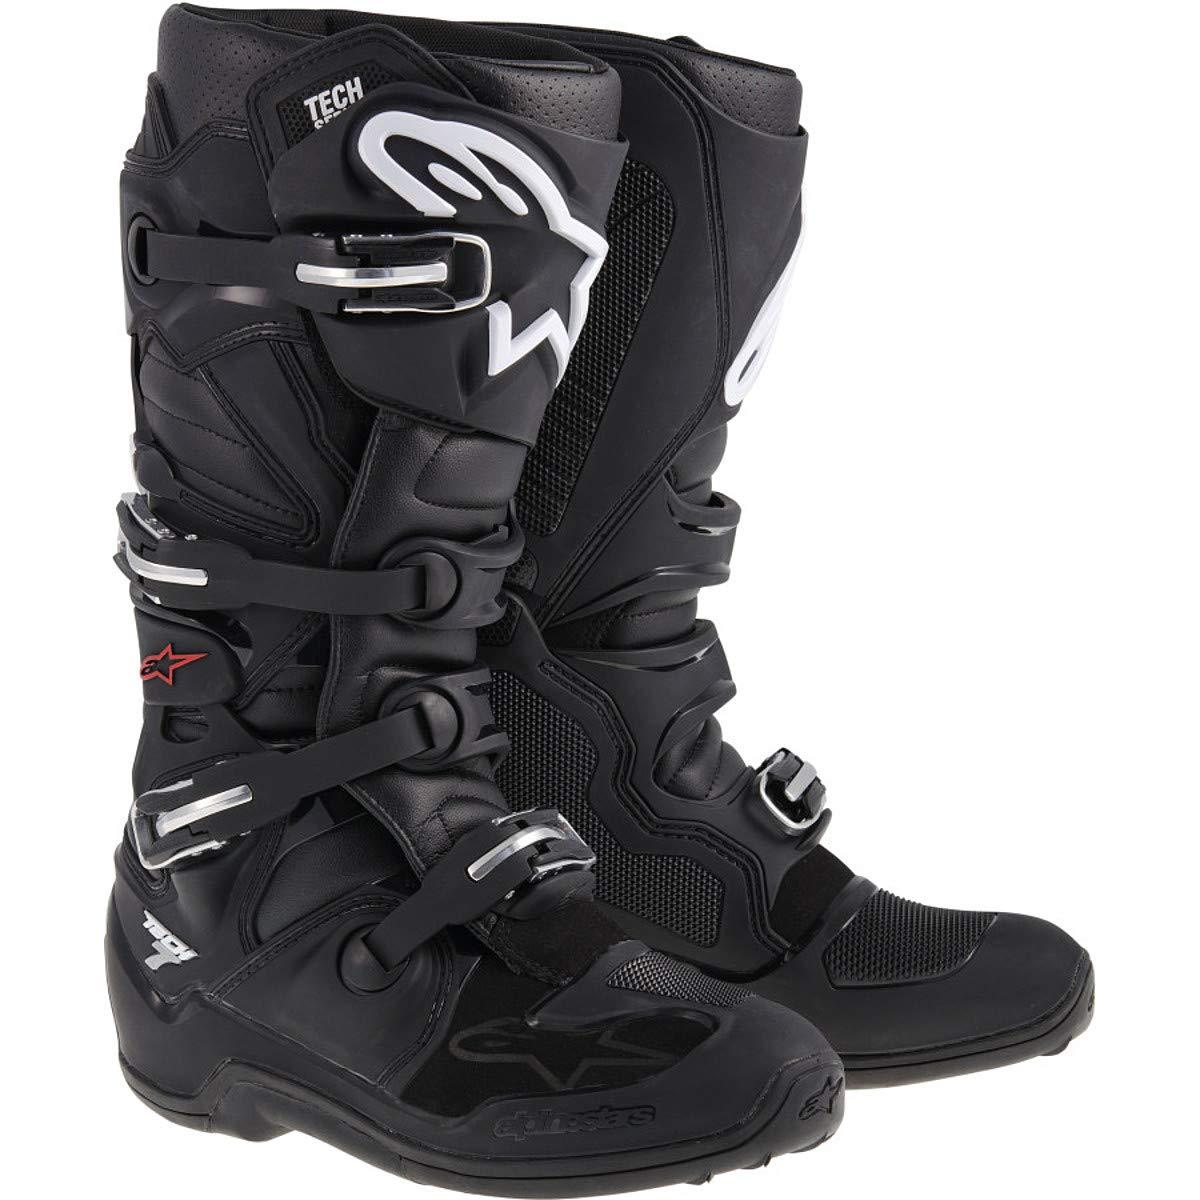 Alpinestars 2018 Tech 7 Boots Black